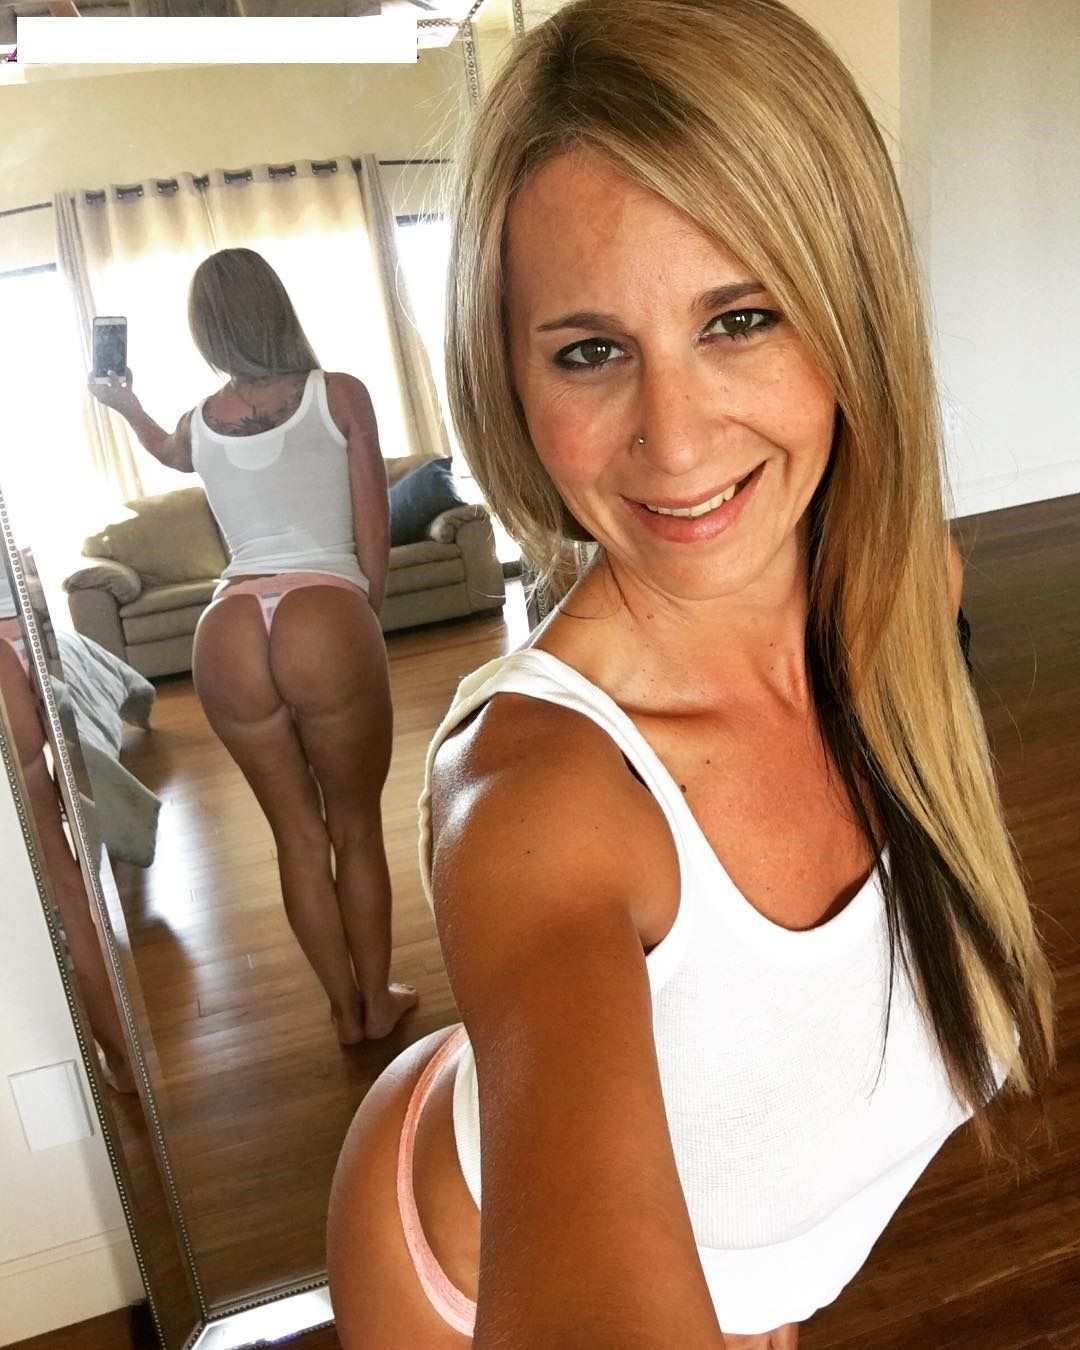 Victoria paris anal porn